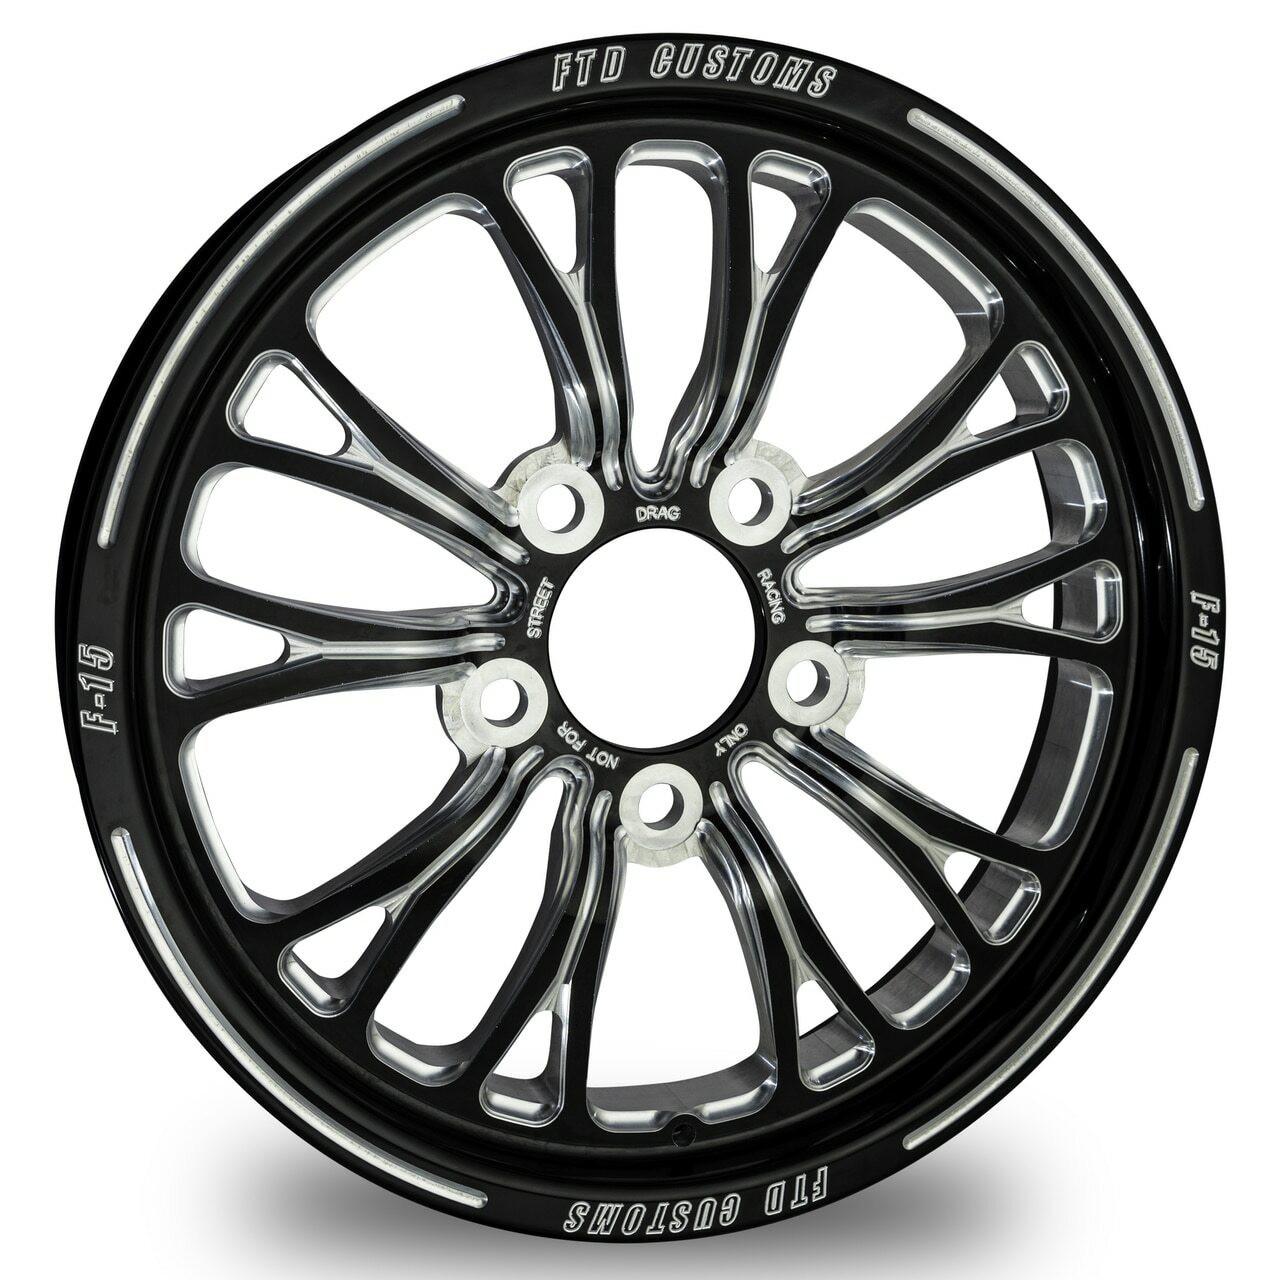 F15 Drag Racing Wheel - FTD Customs black anodized Drag Race Wheel